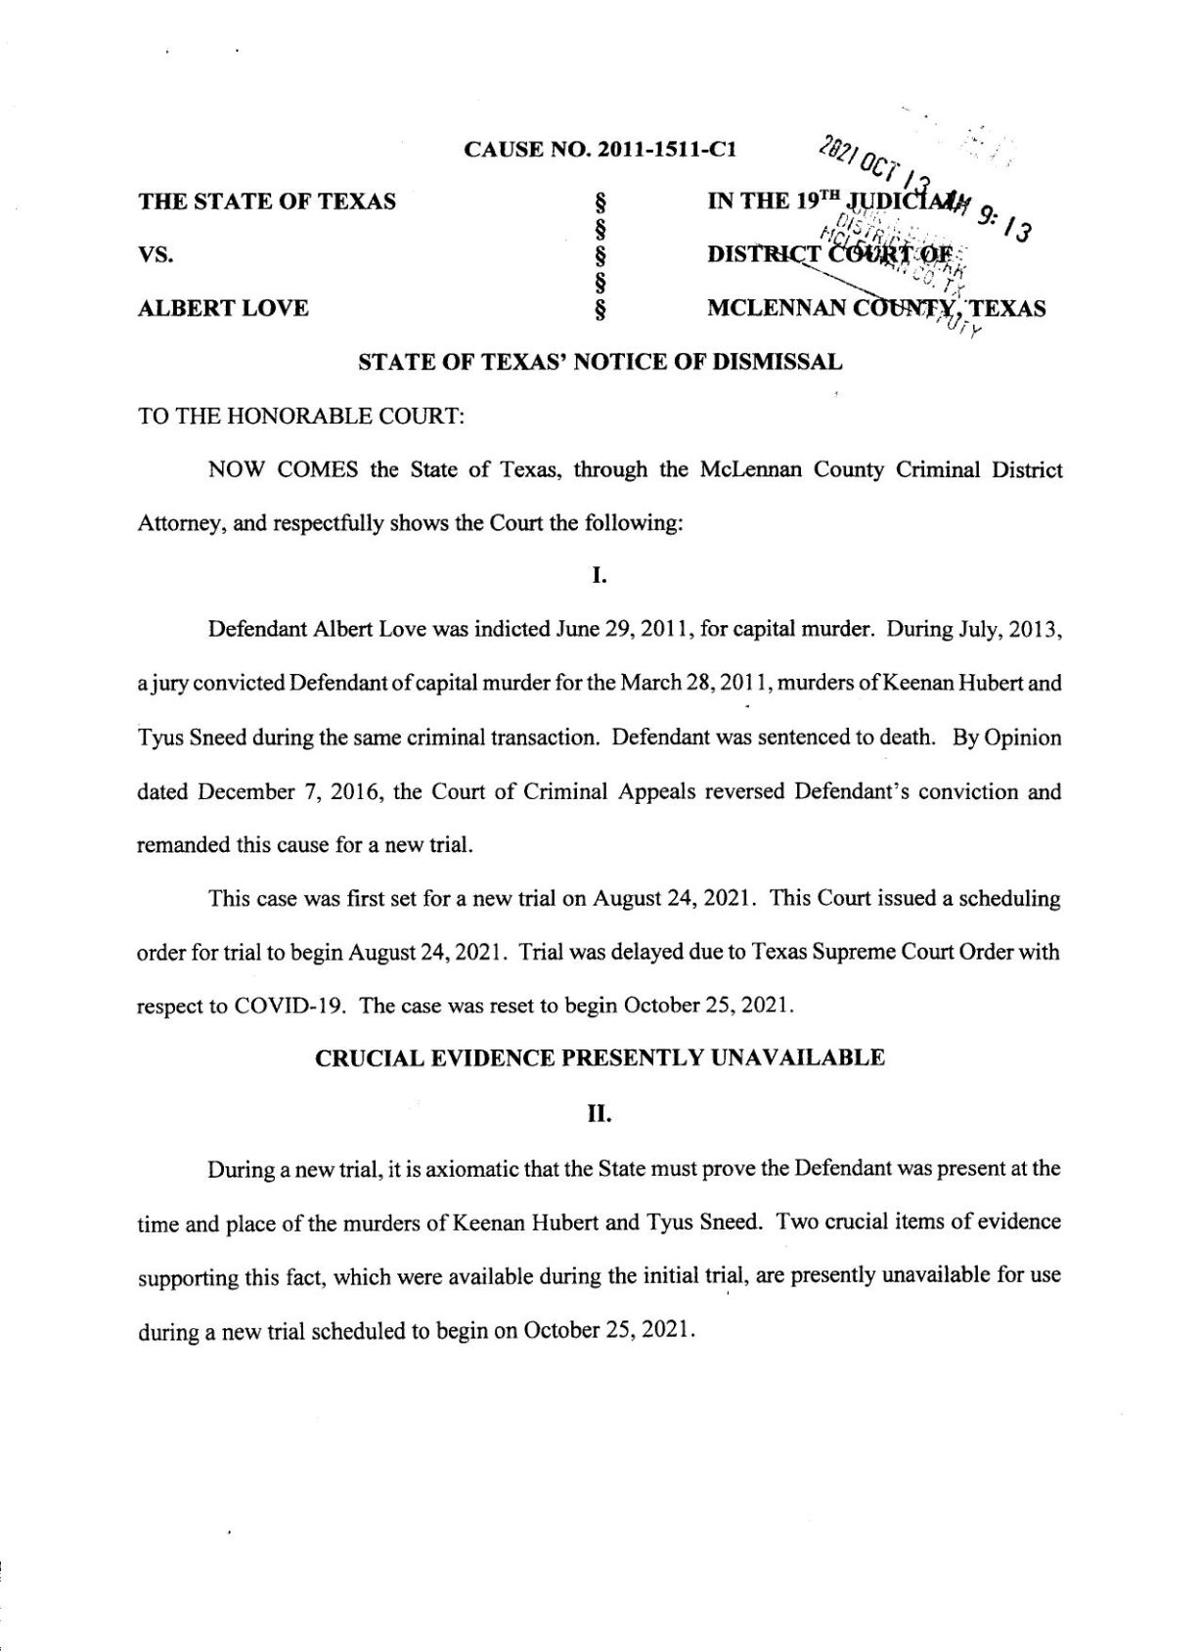 PDF: Albert Love case dismissal (Oct. 13, 2021)